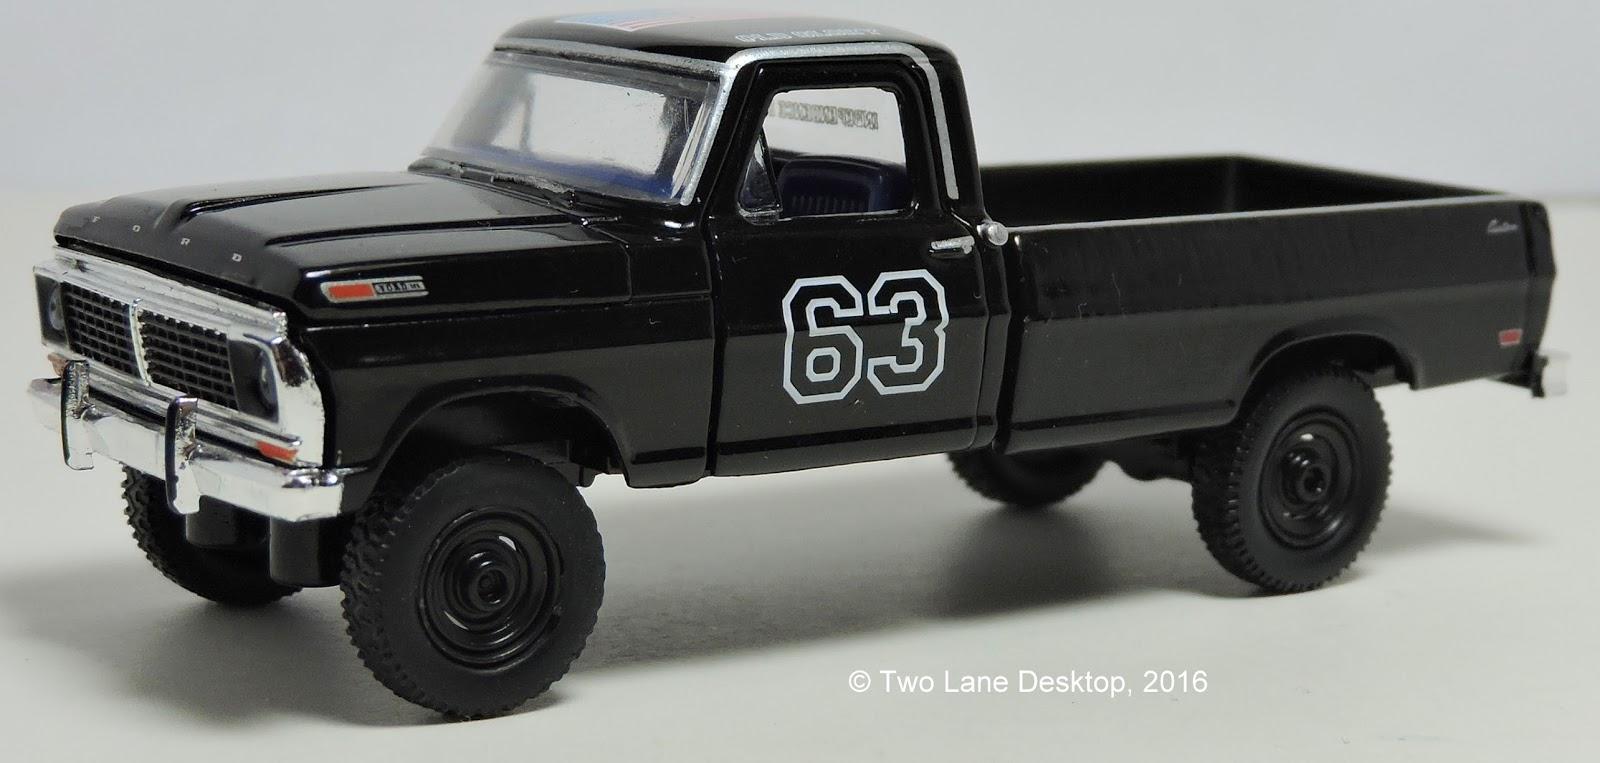 Old Ford Trucks 4x4 Elegant Prevnext With 1970 F 350 Affordable M Machines Custom X